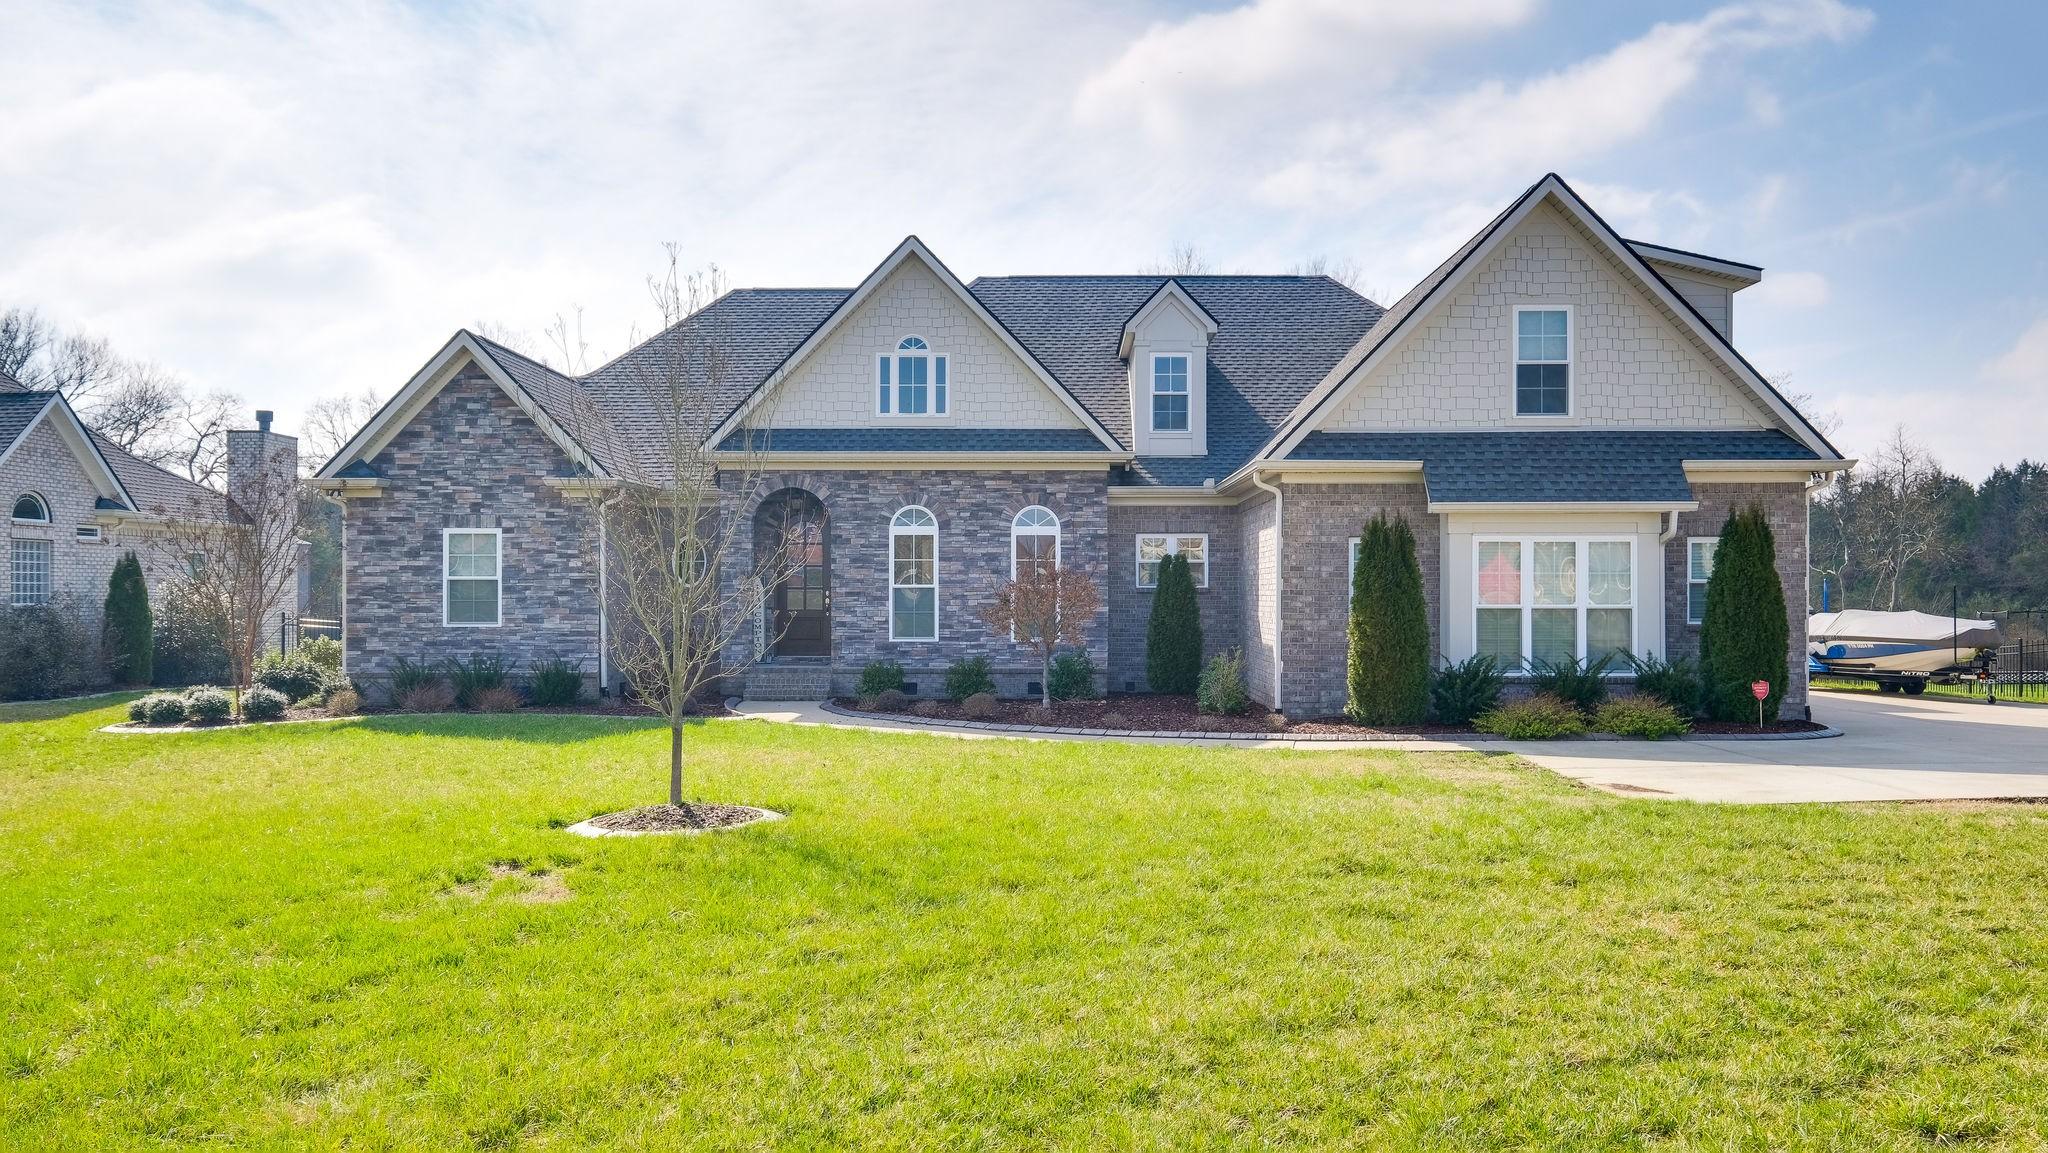 1146 Compton Rd, Murfreesboro, TN 37130 - Murfreesboro, TN real estate listing